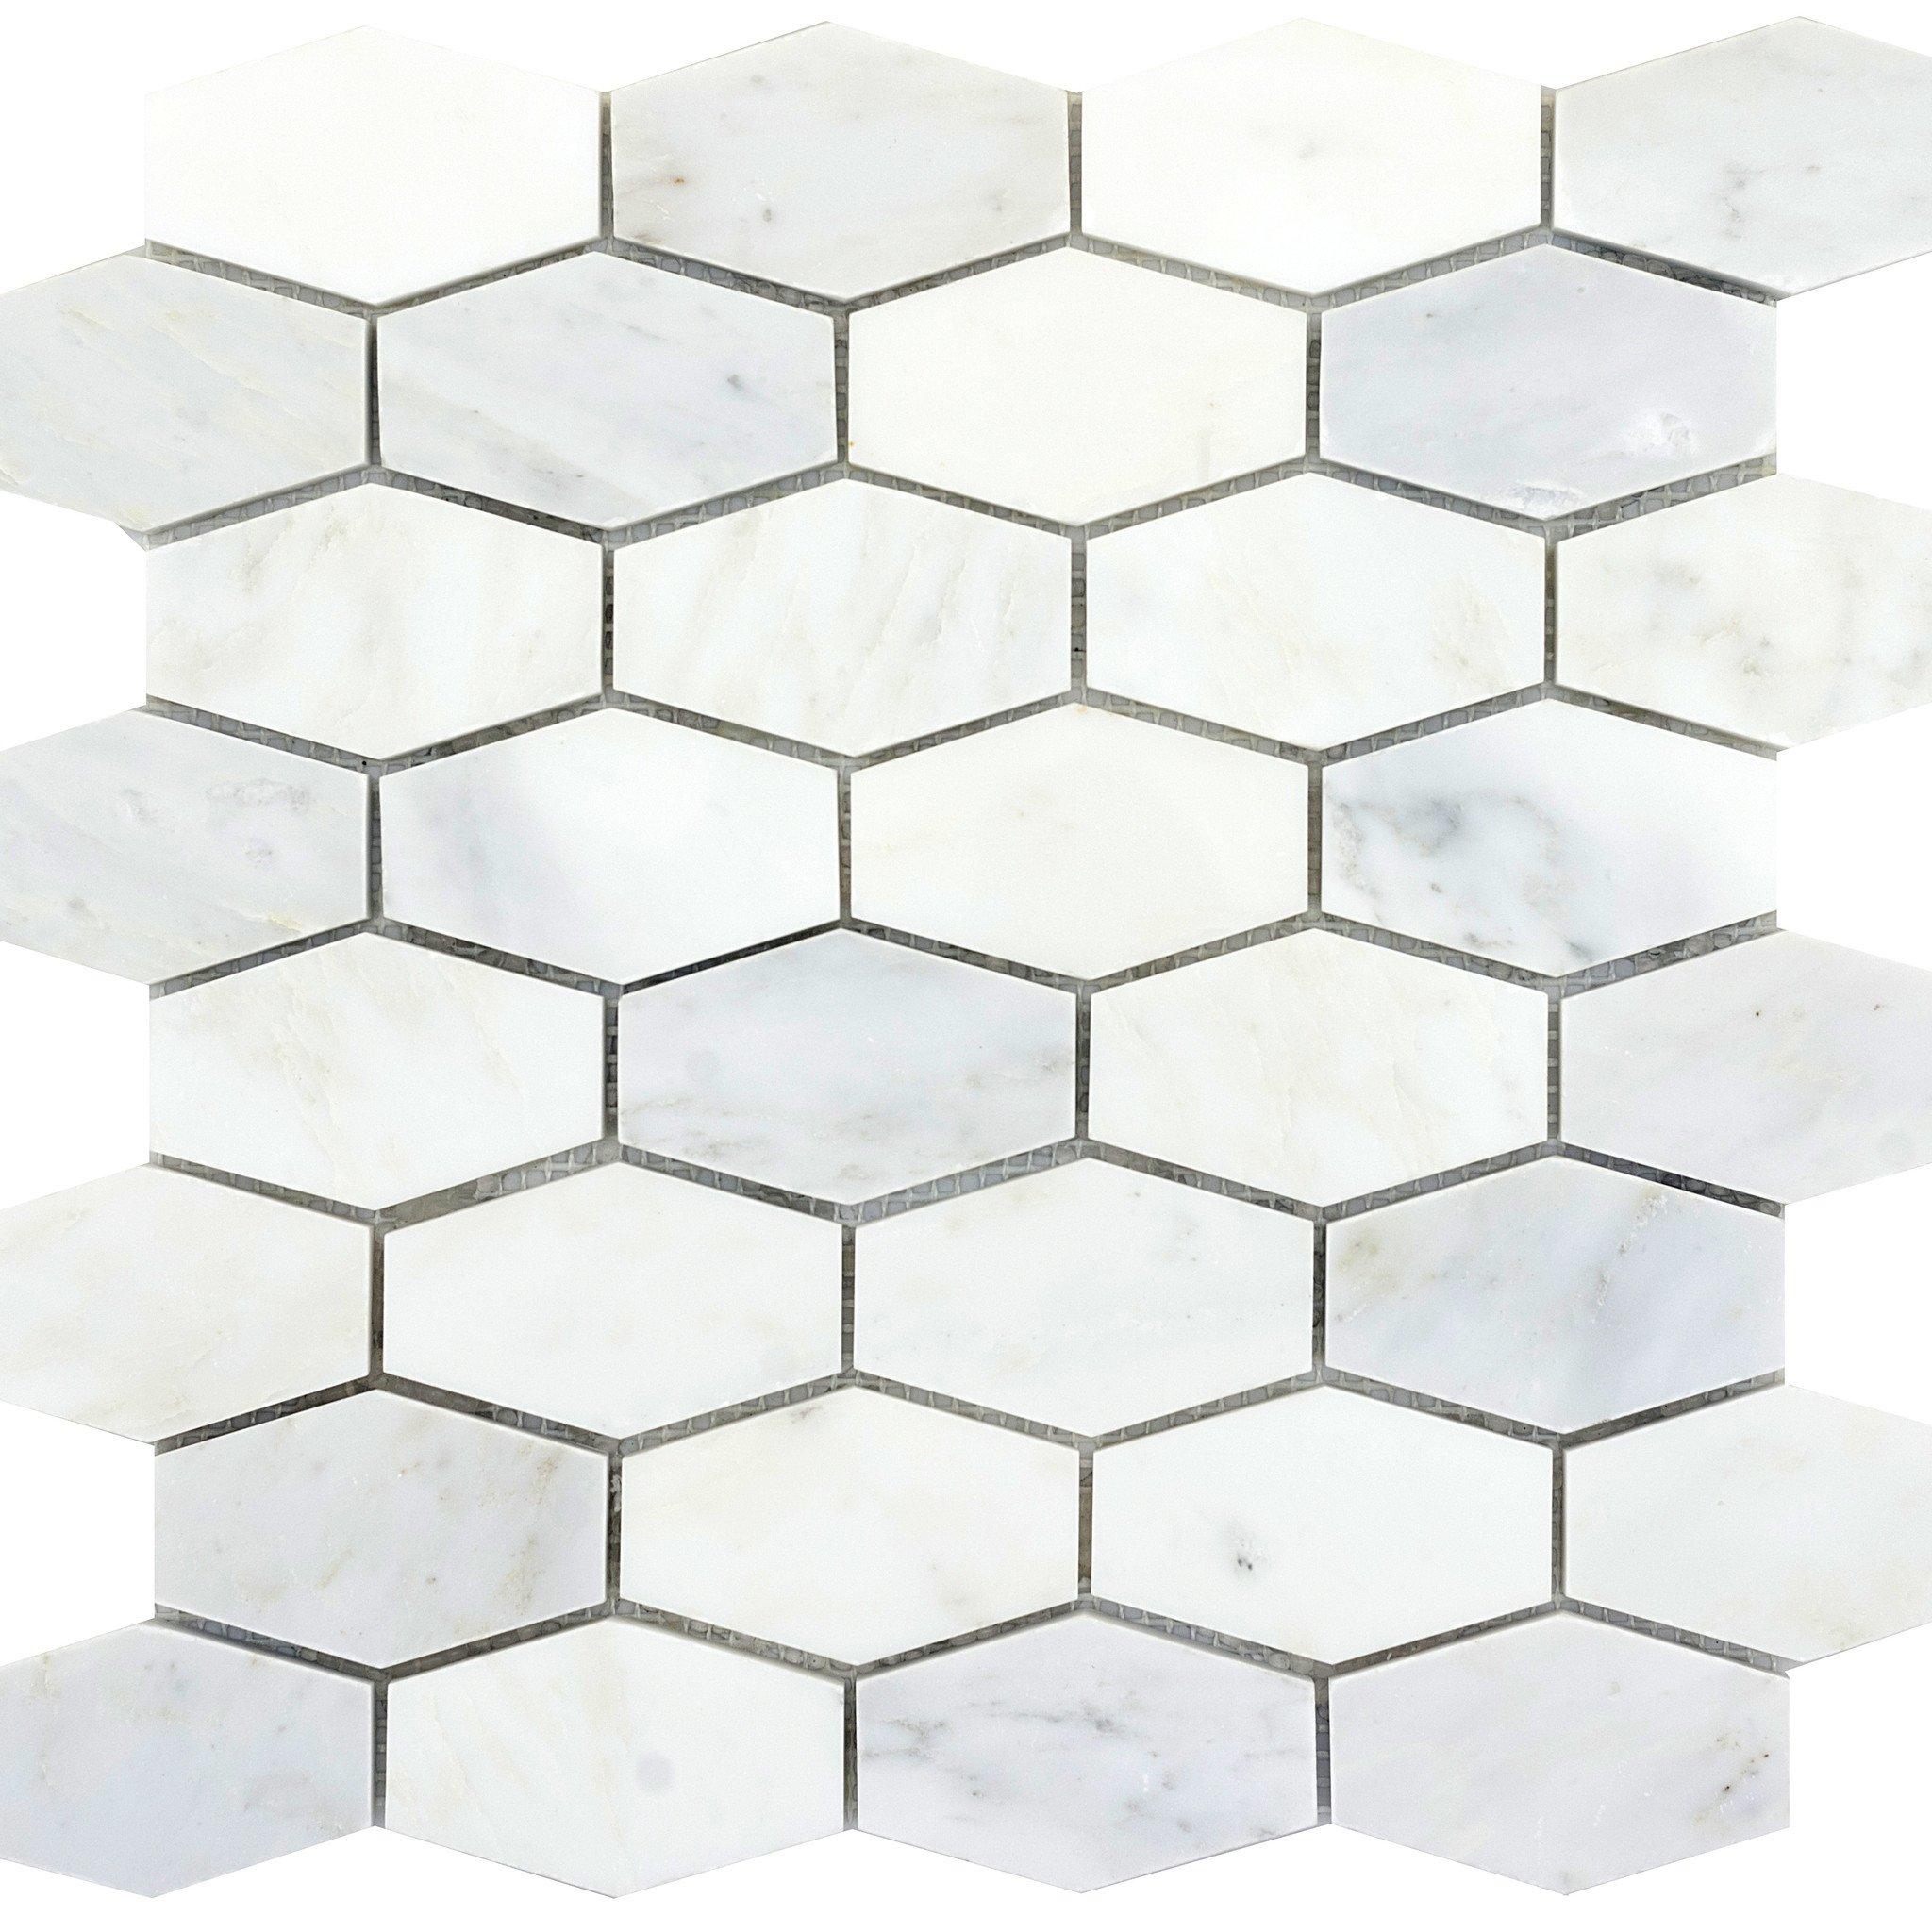 winter-frost-hexagon-wide_d12d5edf-75c1-4b4b-b517-f86760ff3826.jpg